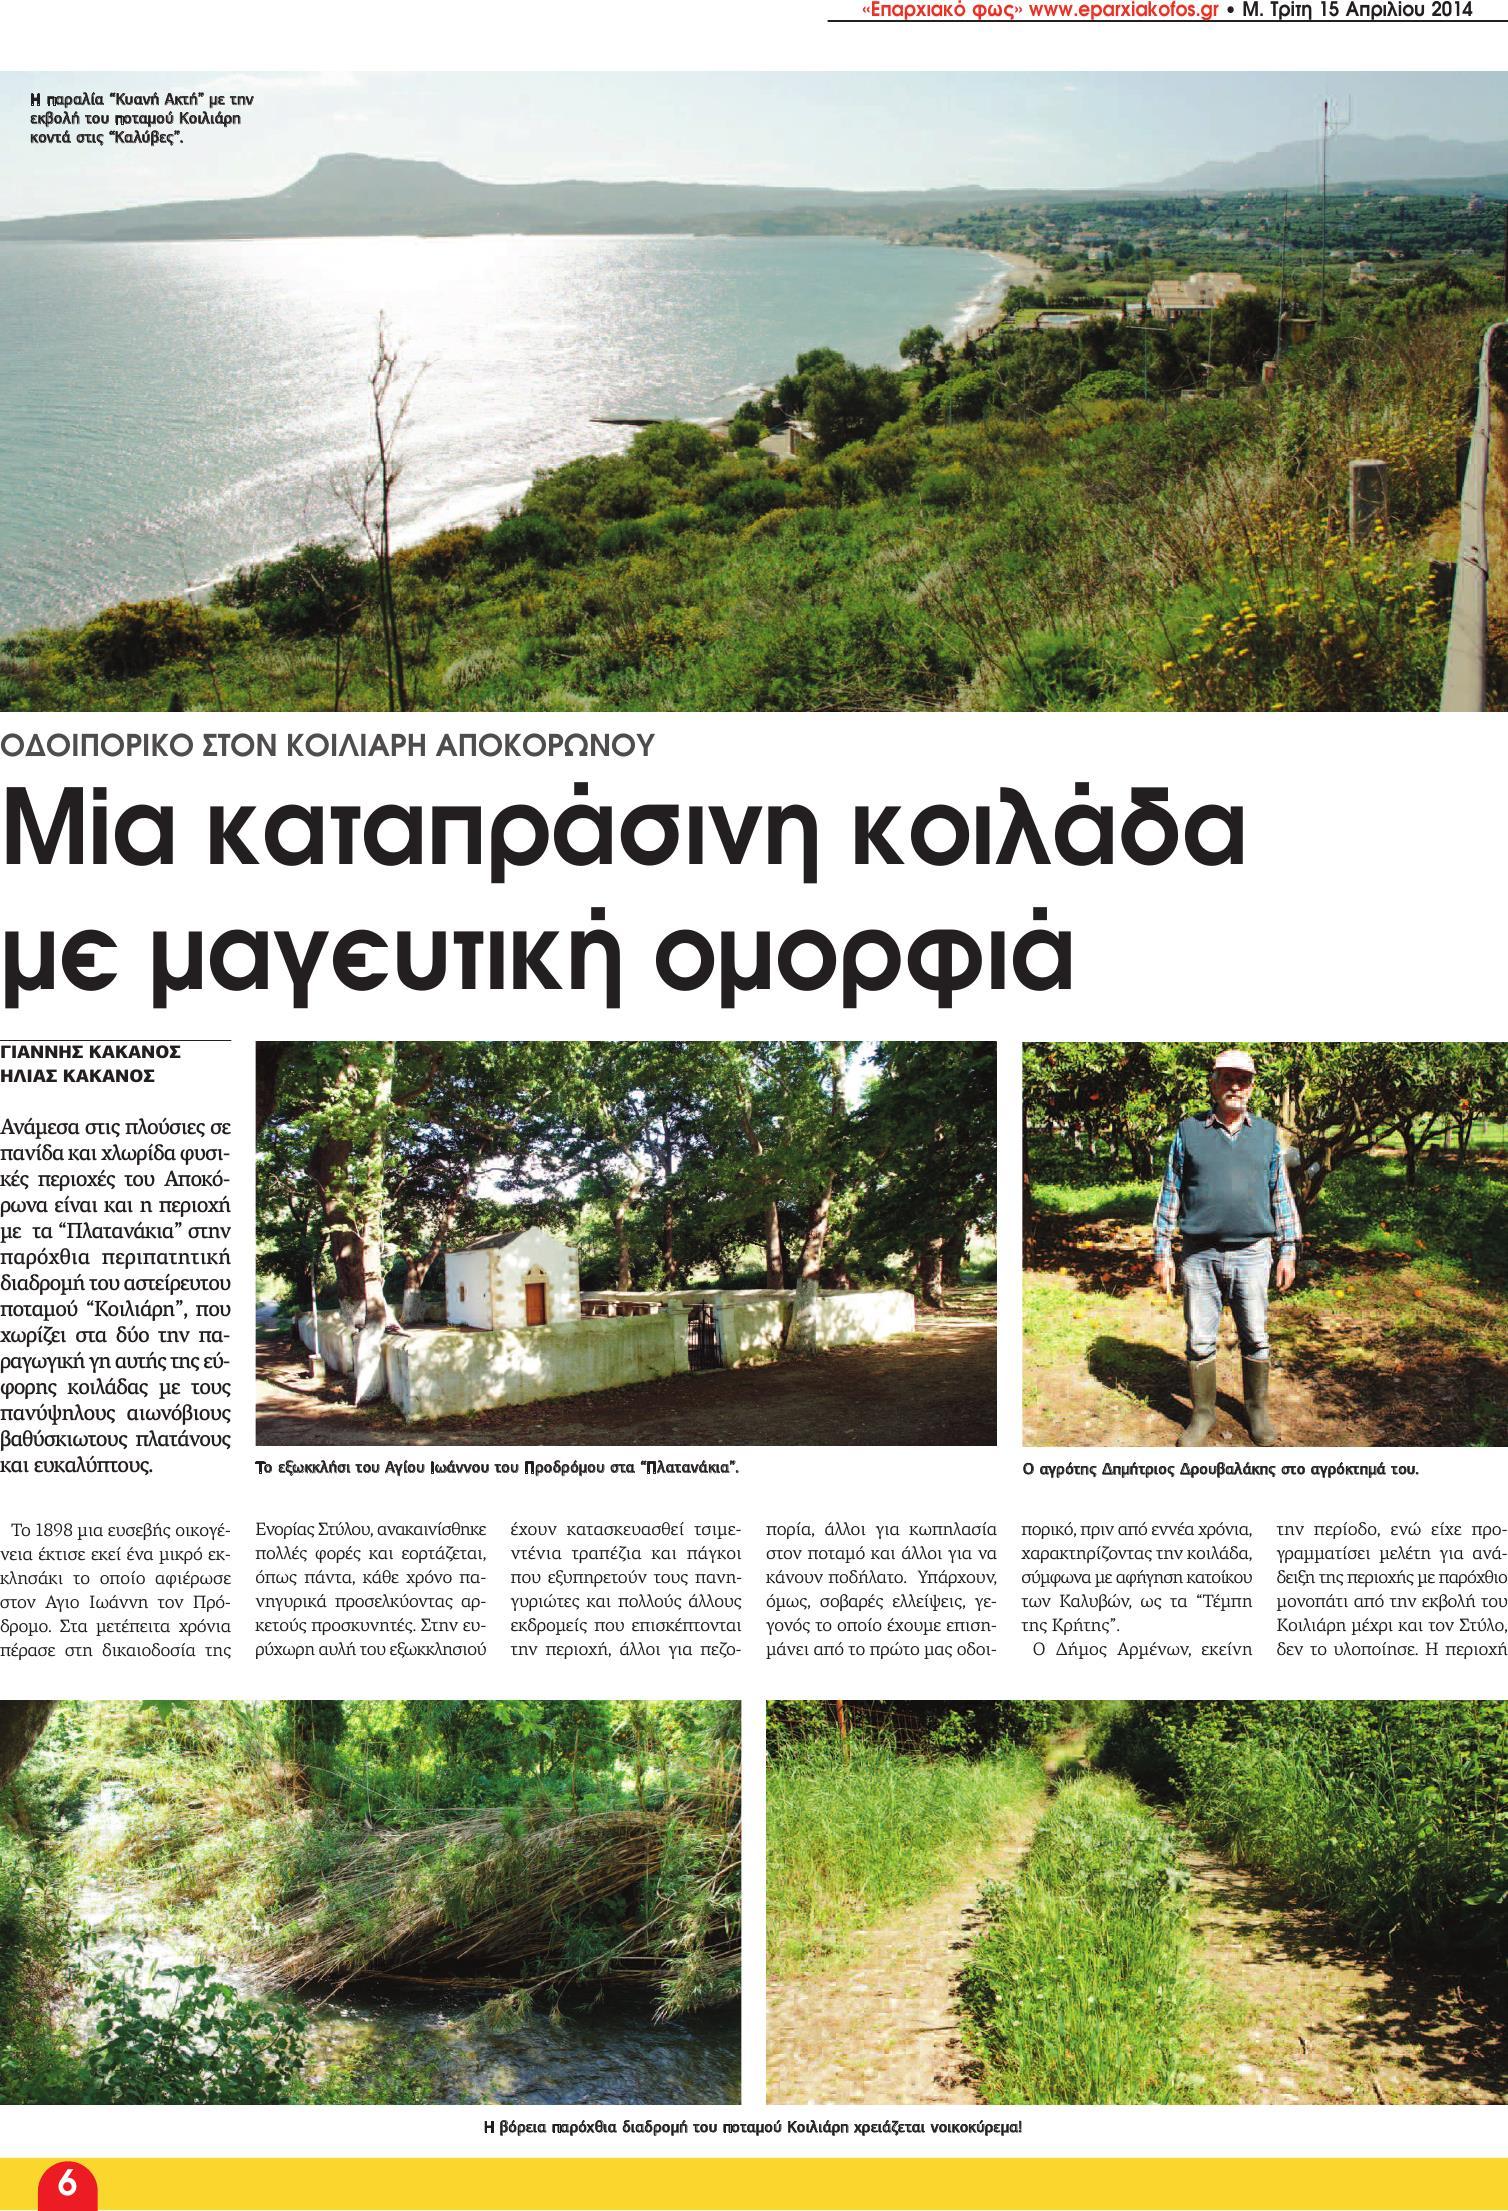 06 kakanos leukoma (Page 06)